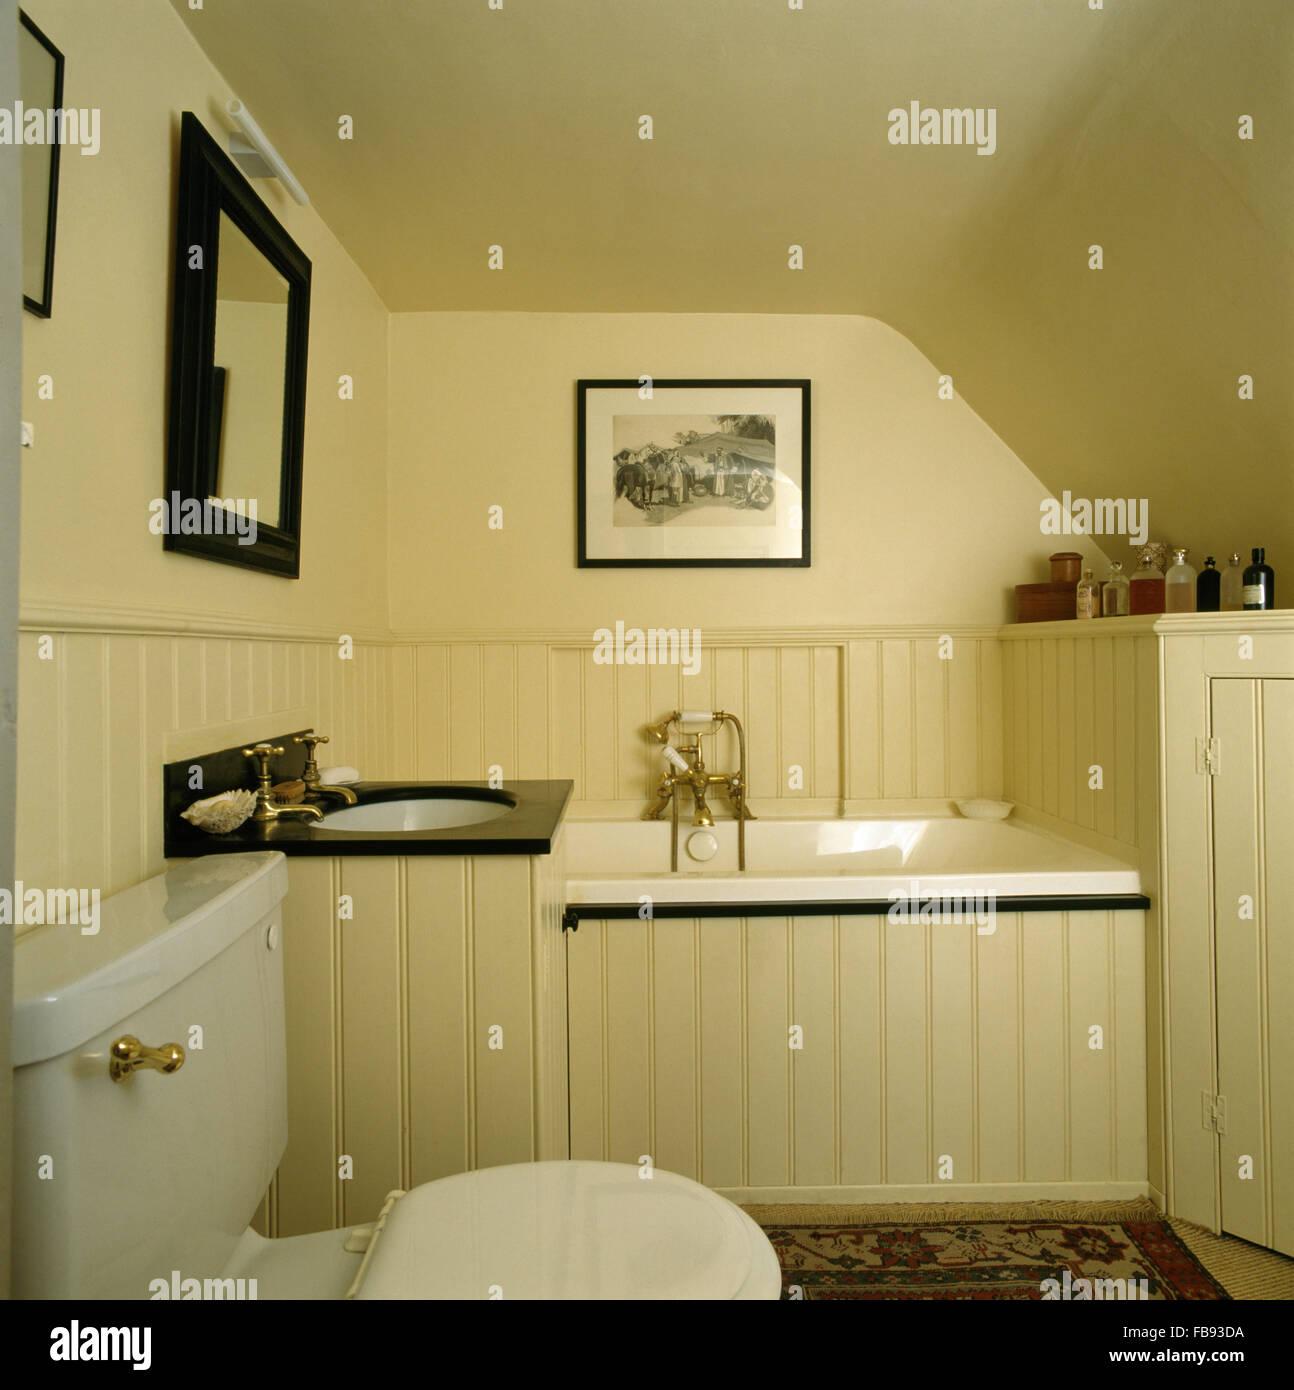 Small cream, tongue+groove paneled bathroom Stock Photo - Alamy